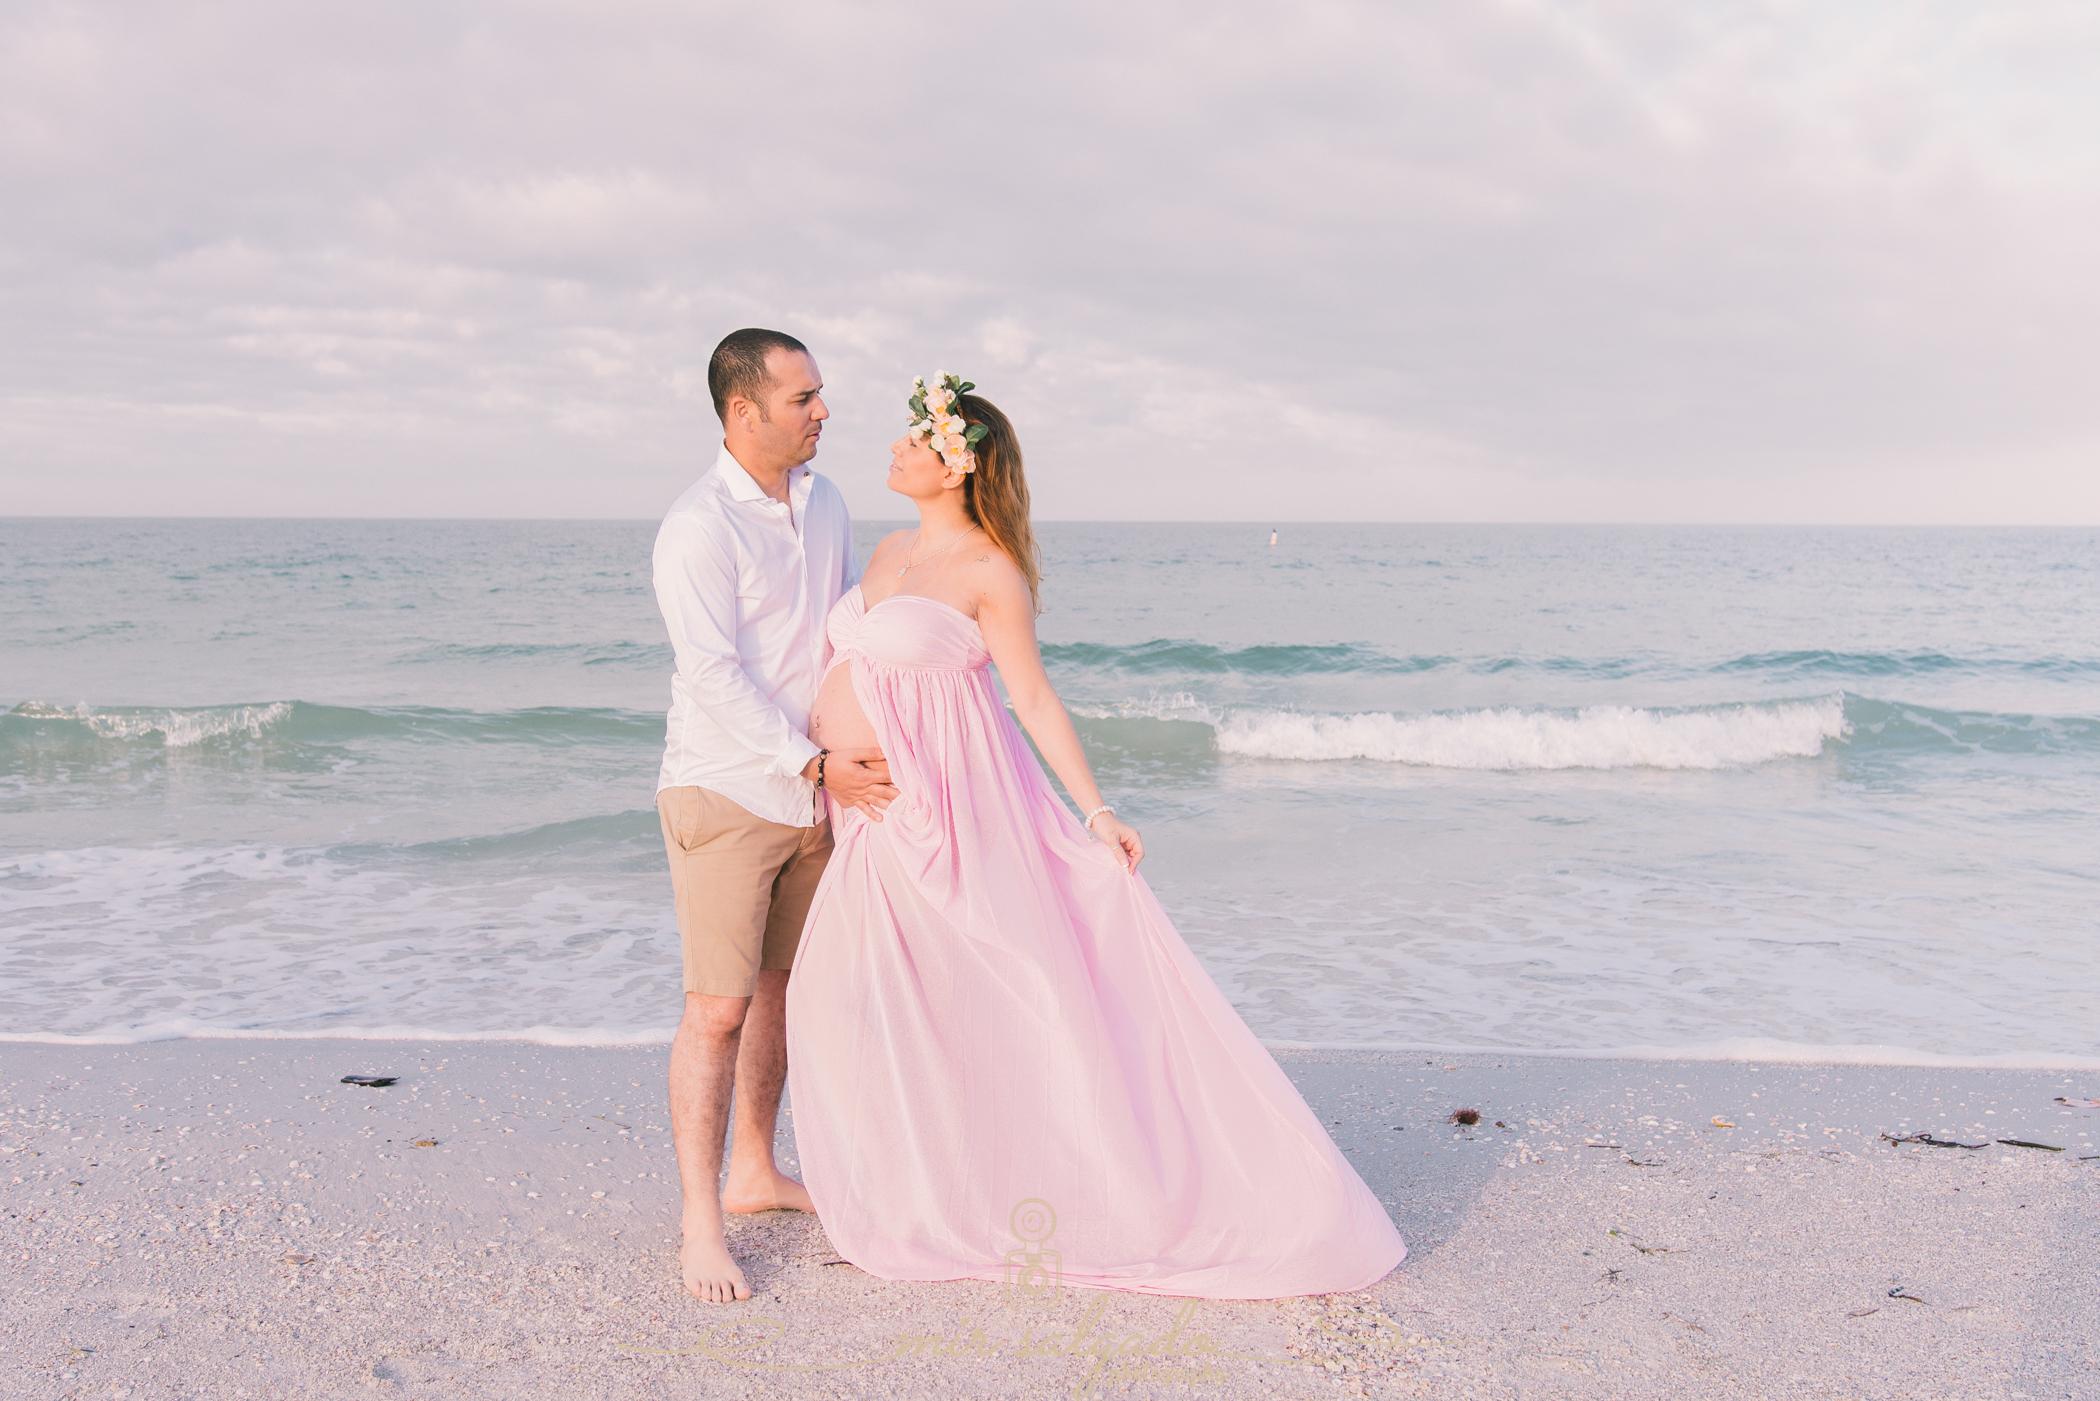 St.Pete-beach-maternity-photo, Tampa-photographer